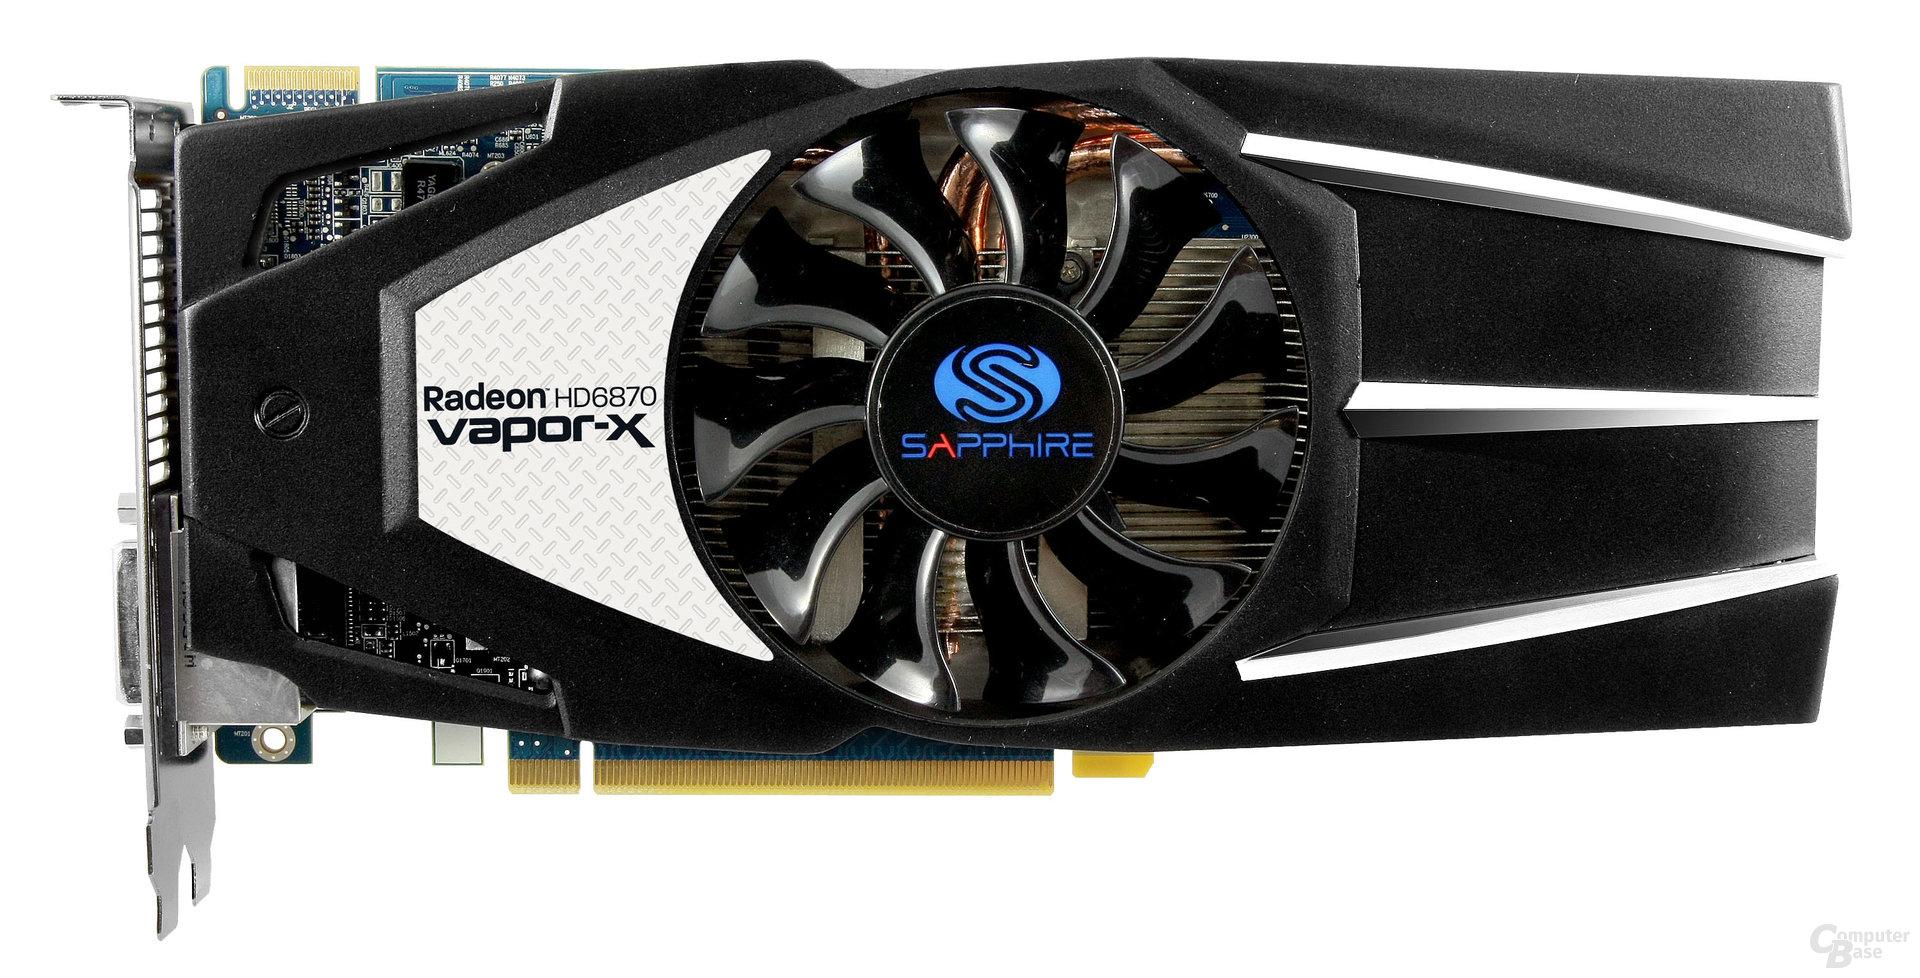 Sapphire Radeon HD 6870 Vapor-X